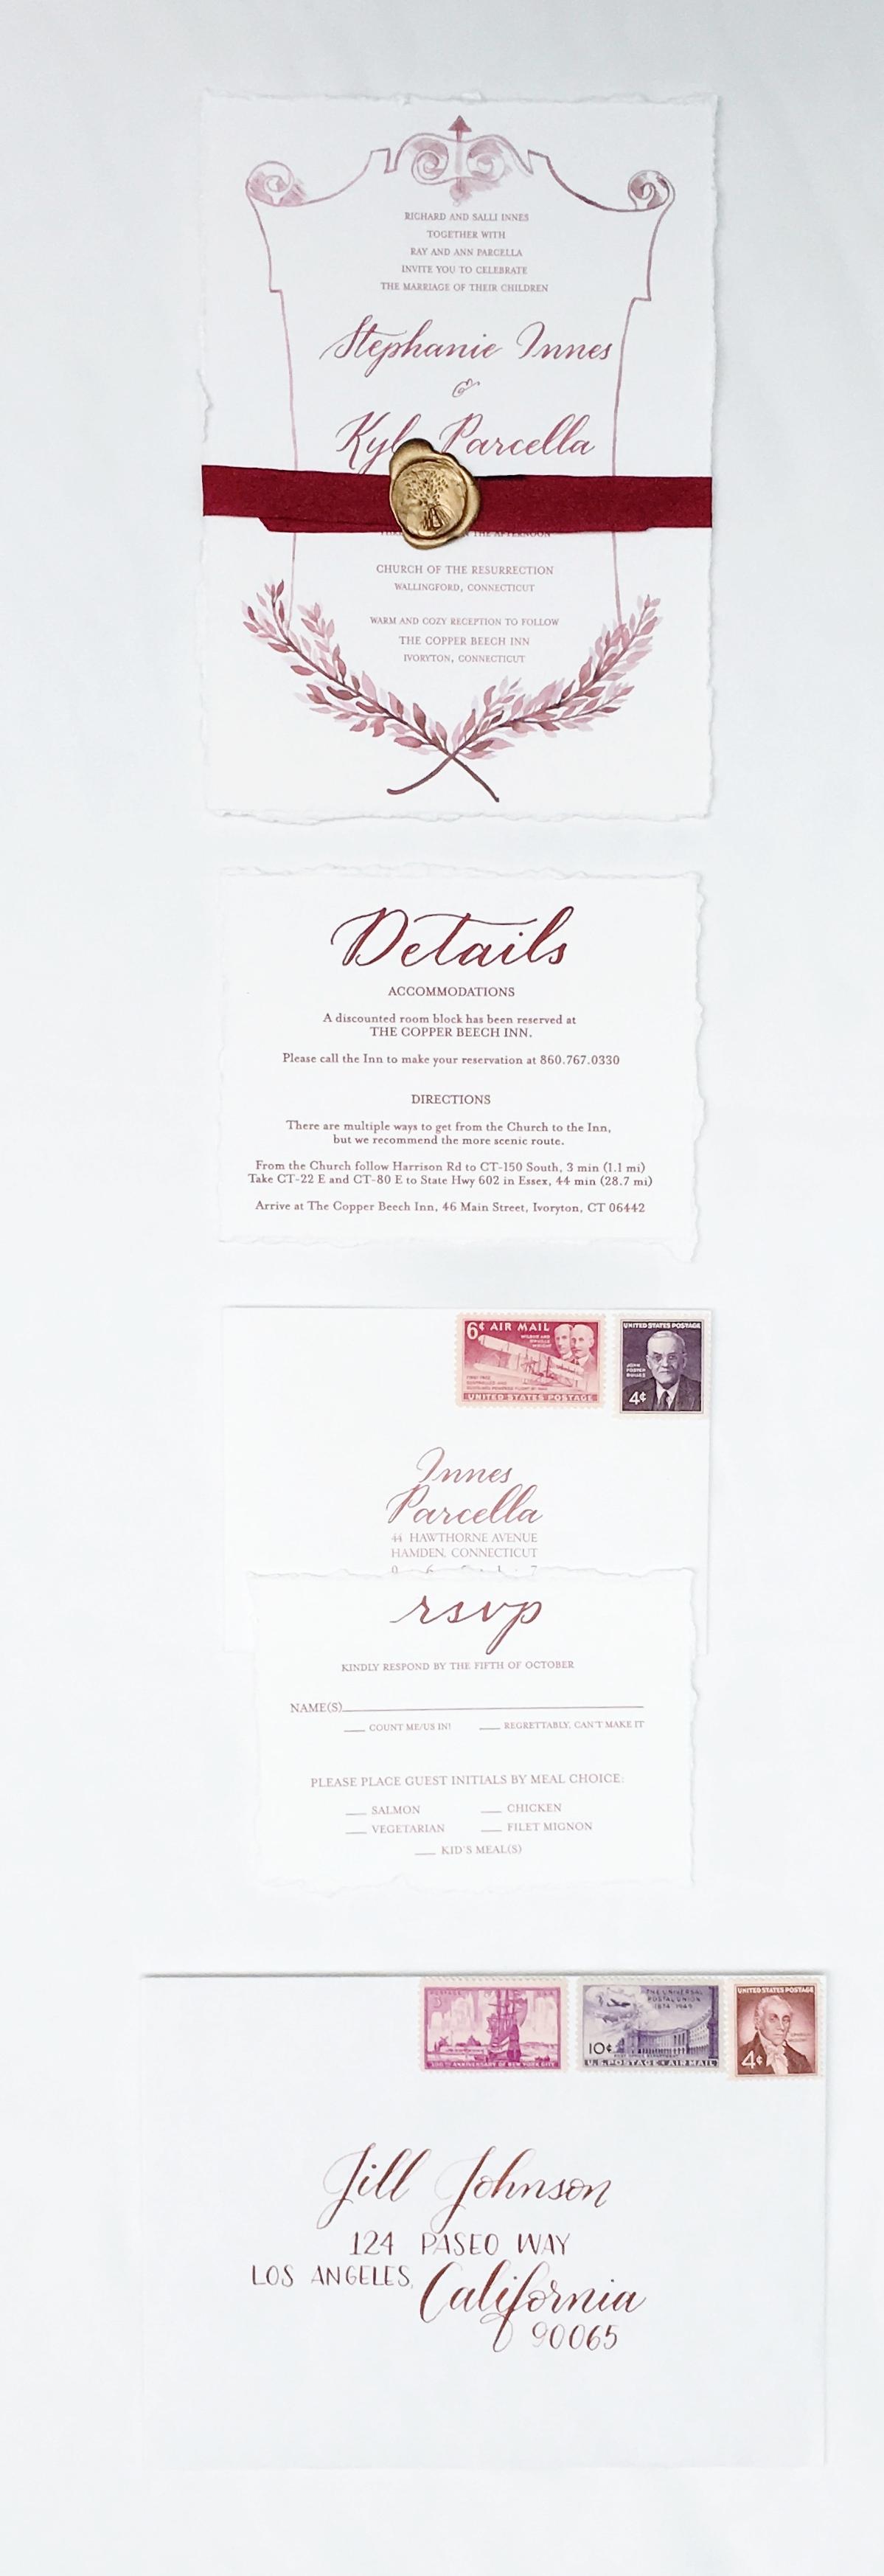 watercolor wine wedding invitation crest announcement frame